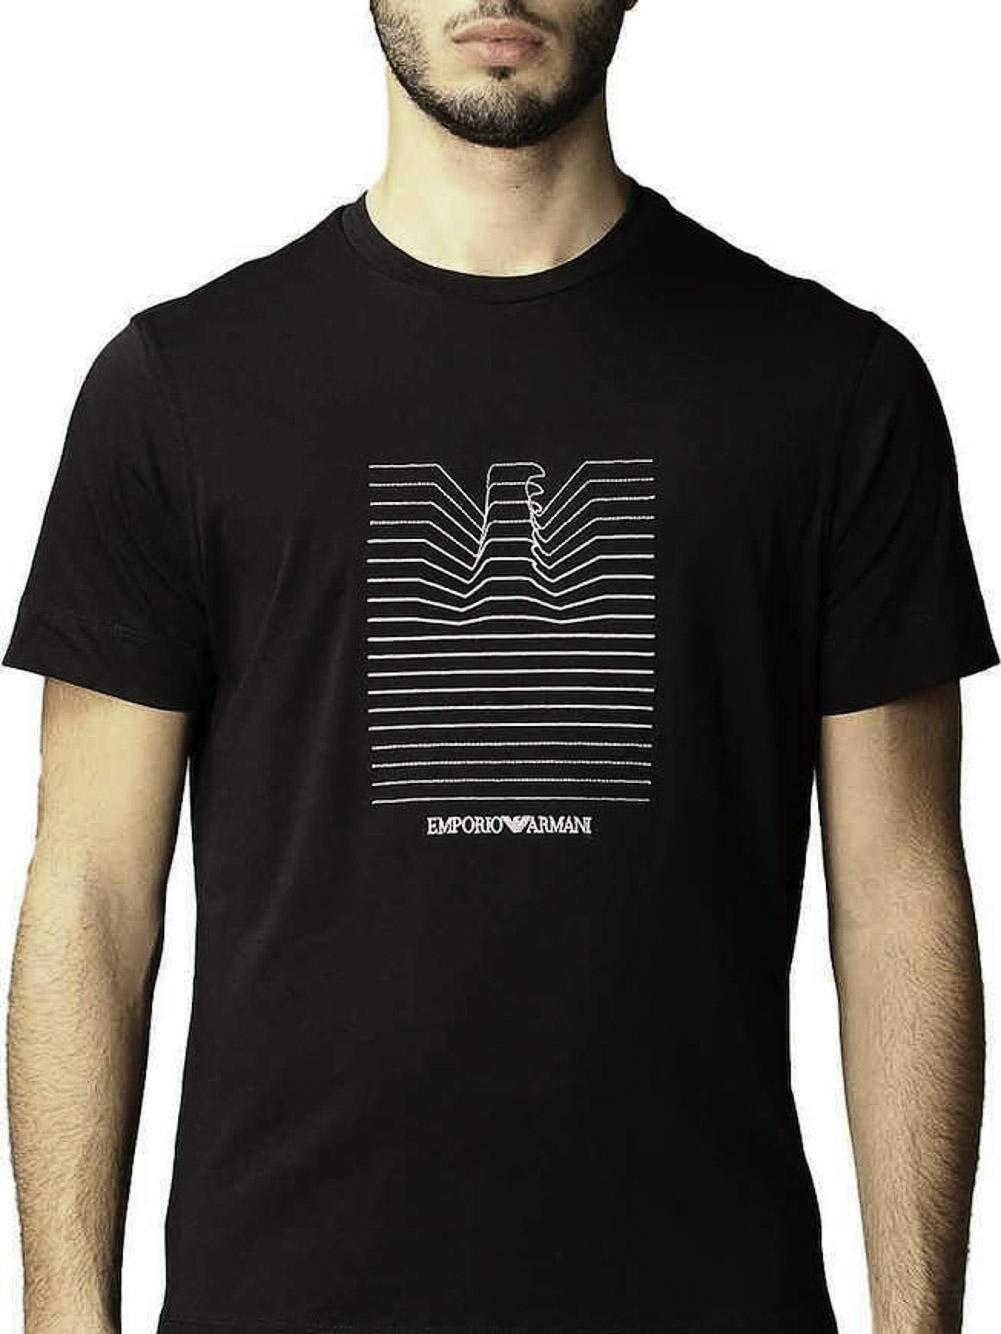 EMPORIO ARMANI Μπλούζα t-shirt 3K1TL81JULZ-0920 ΜΠΛΕ